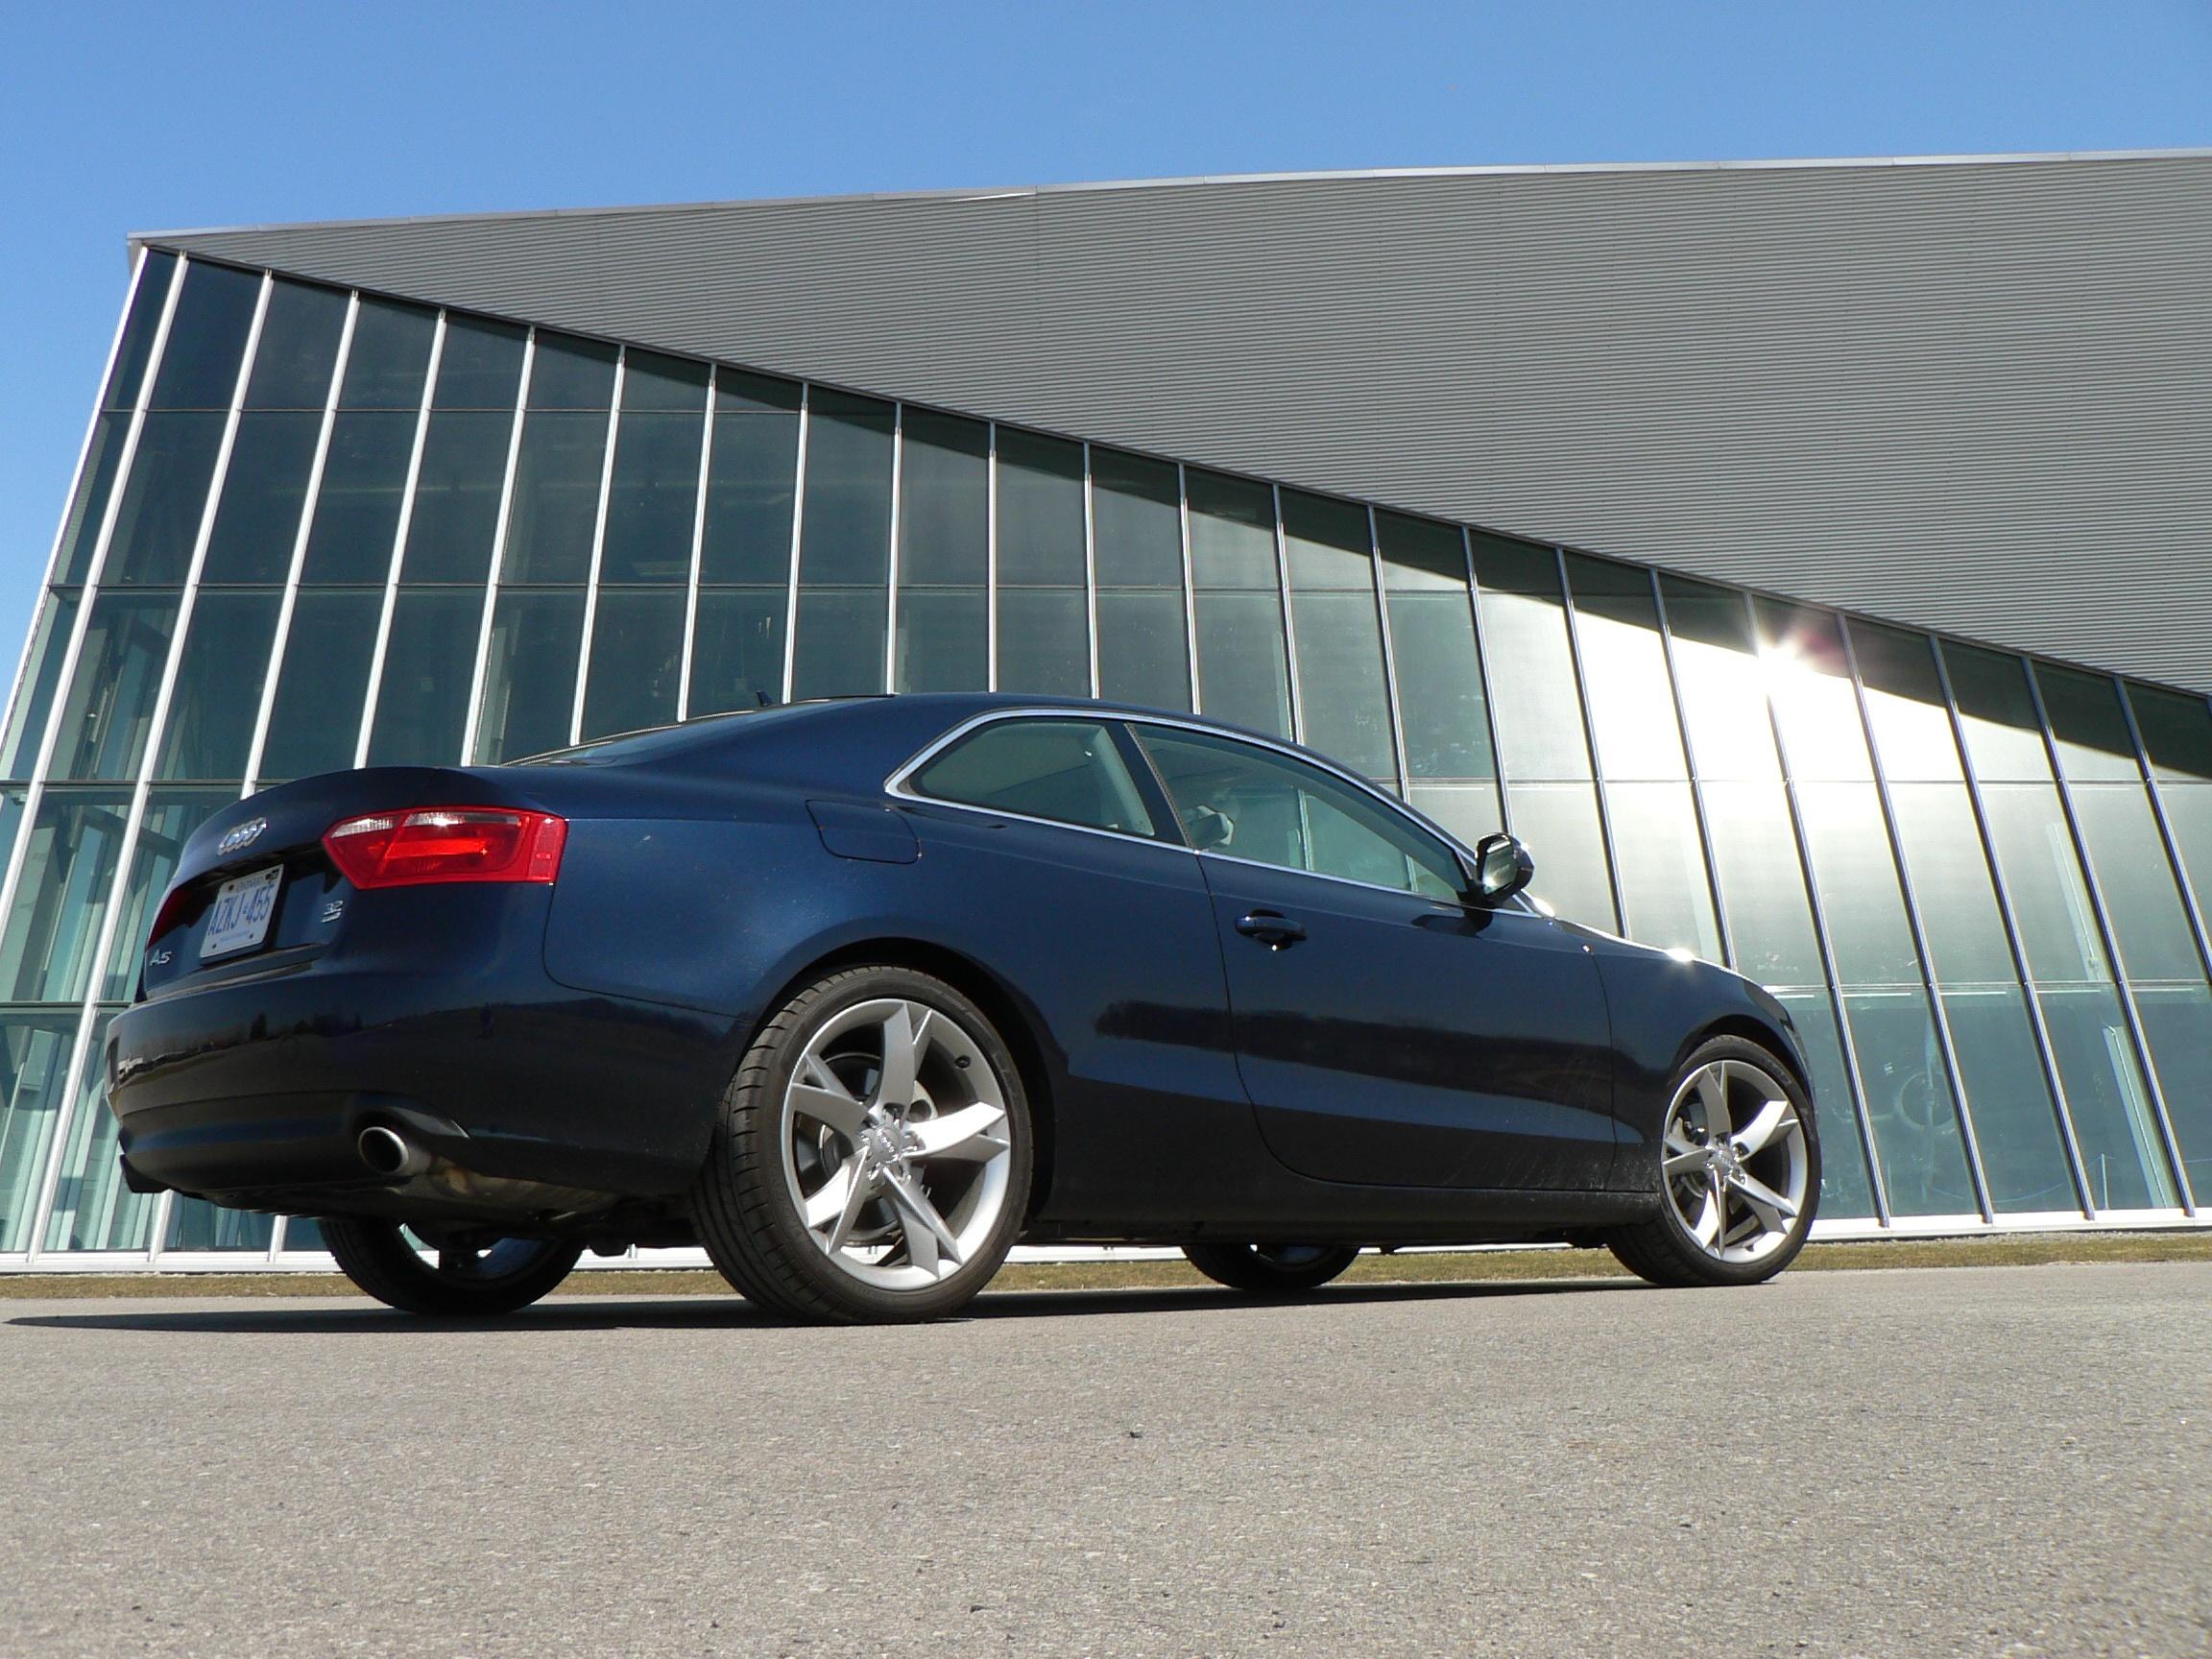 2009 Audi A5 Image 2